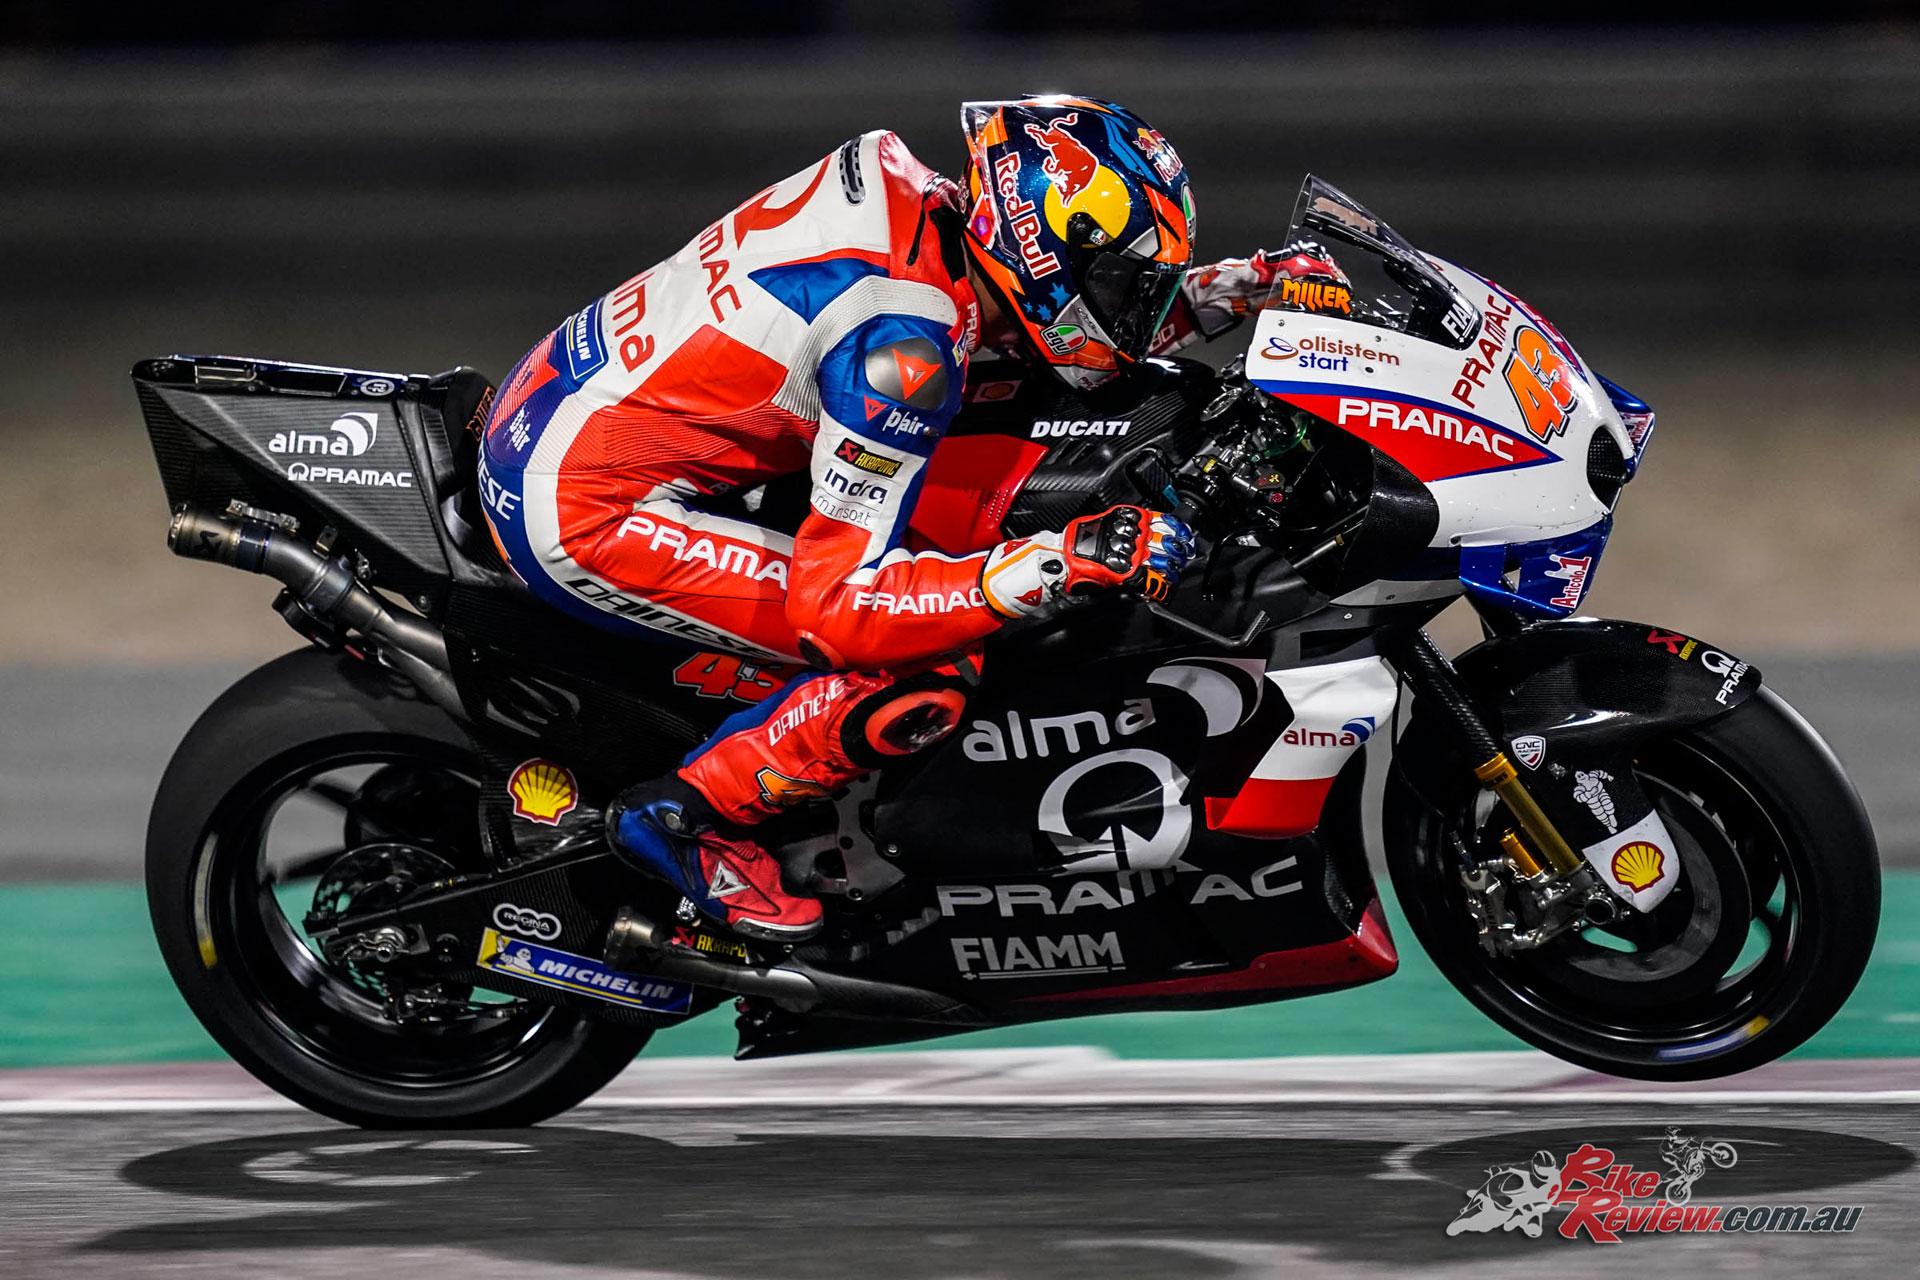 Vinales tops Qatar MotoGP Test - Miller 10th on Day 3 - Bike Review